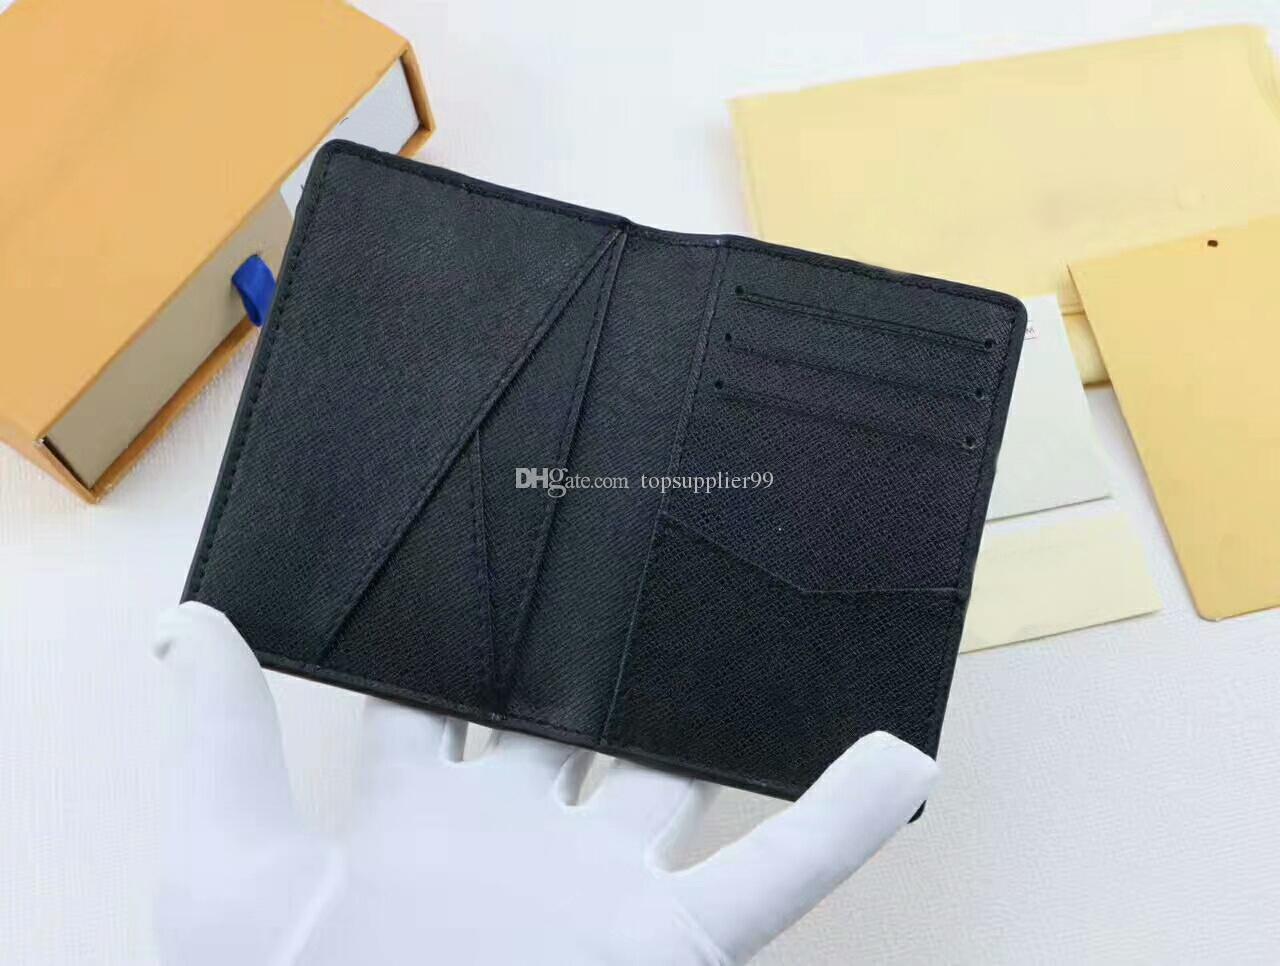 Für 4 Farbe Berühmte Marke Frauen Männer Kartenhalter Kurze Geldbörsen Aus Echtem Leder Hohe Qualität Passport Wallets Freies Verschiffen A3